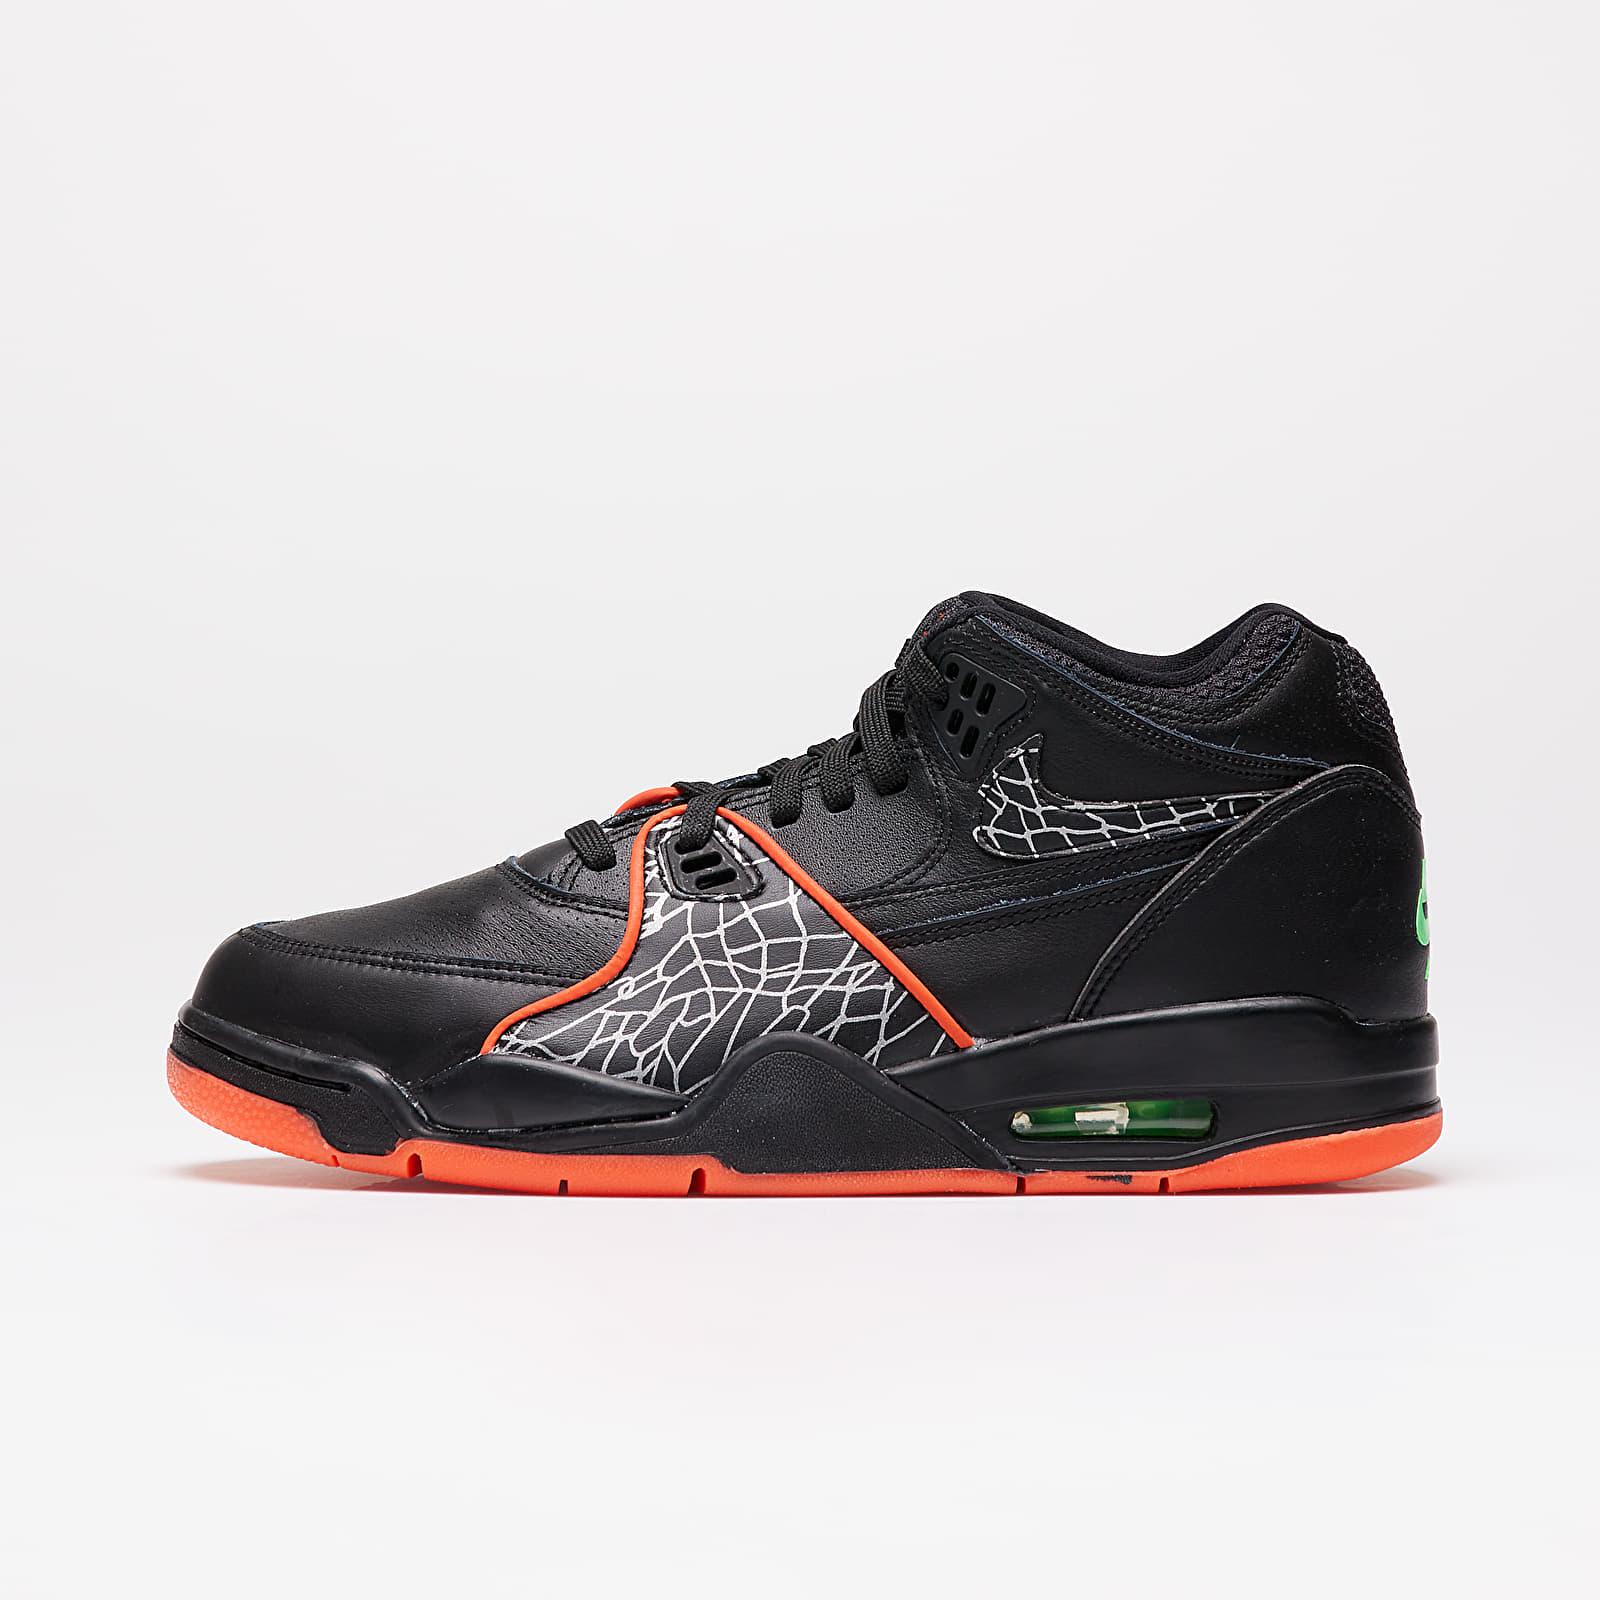 Încălțăminte și sneakerși pentru bărbați Nike Air Flight 89 QS Black/ Orange Blaze-Green Strike-White